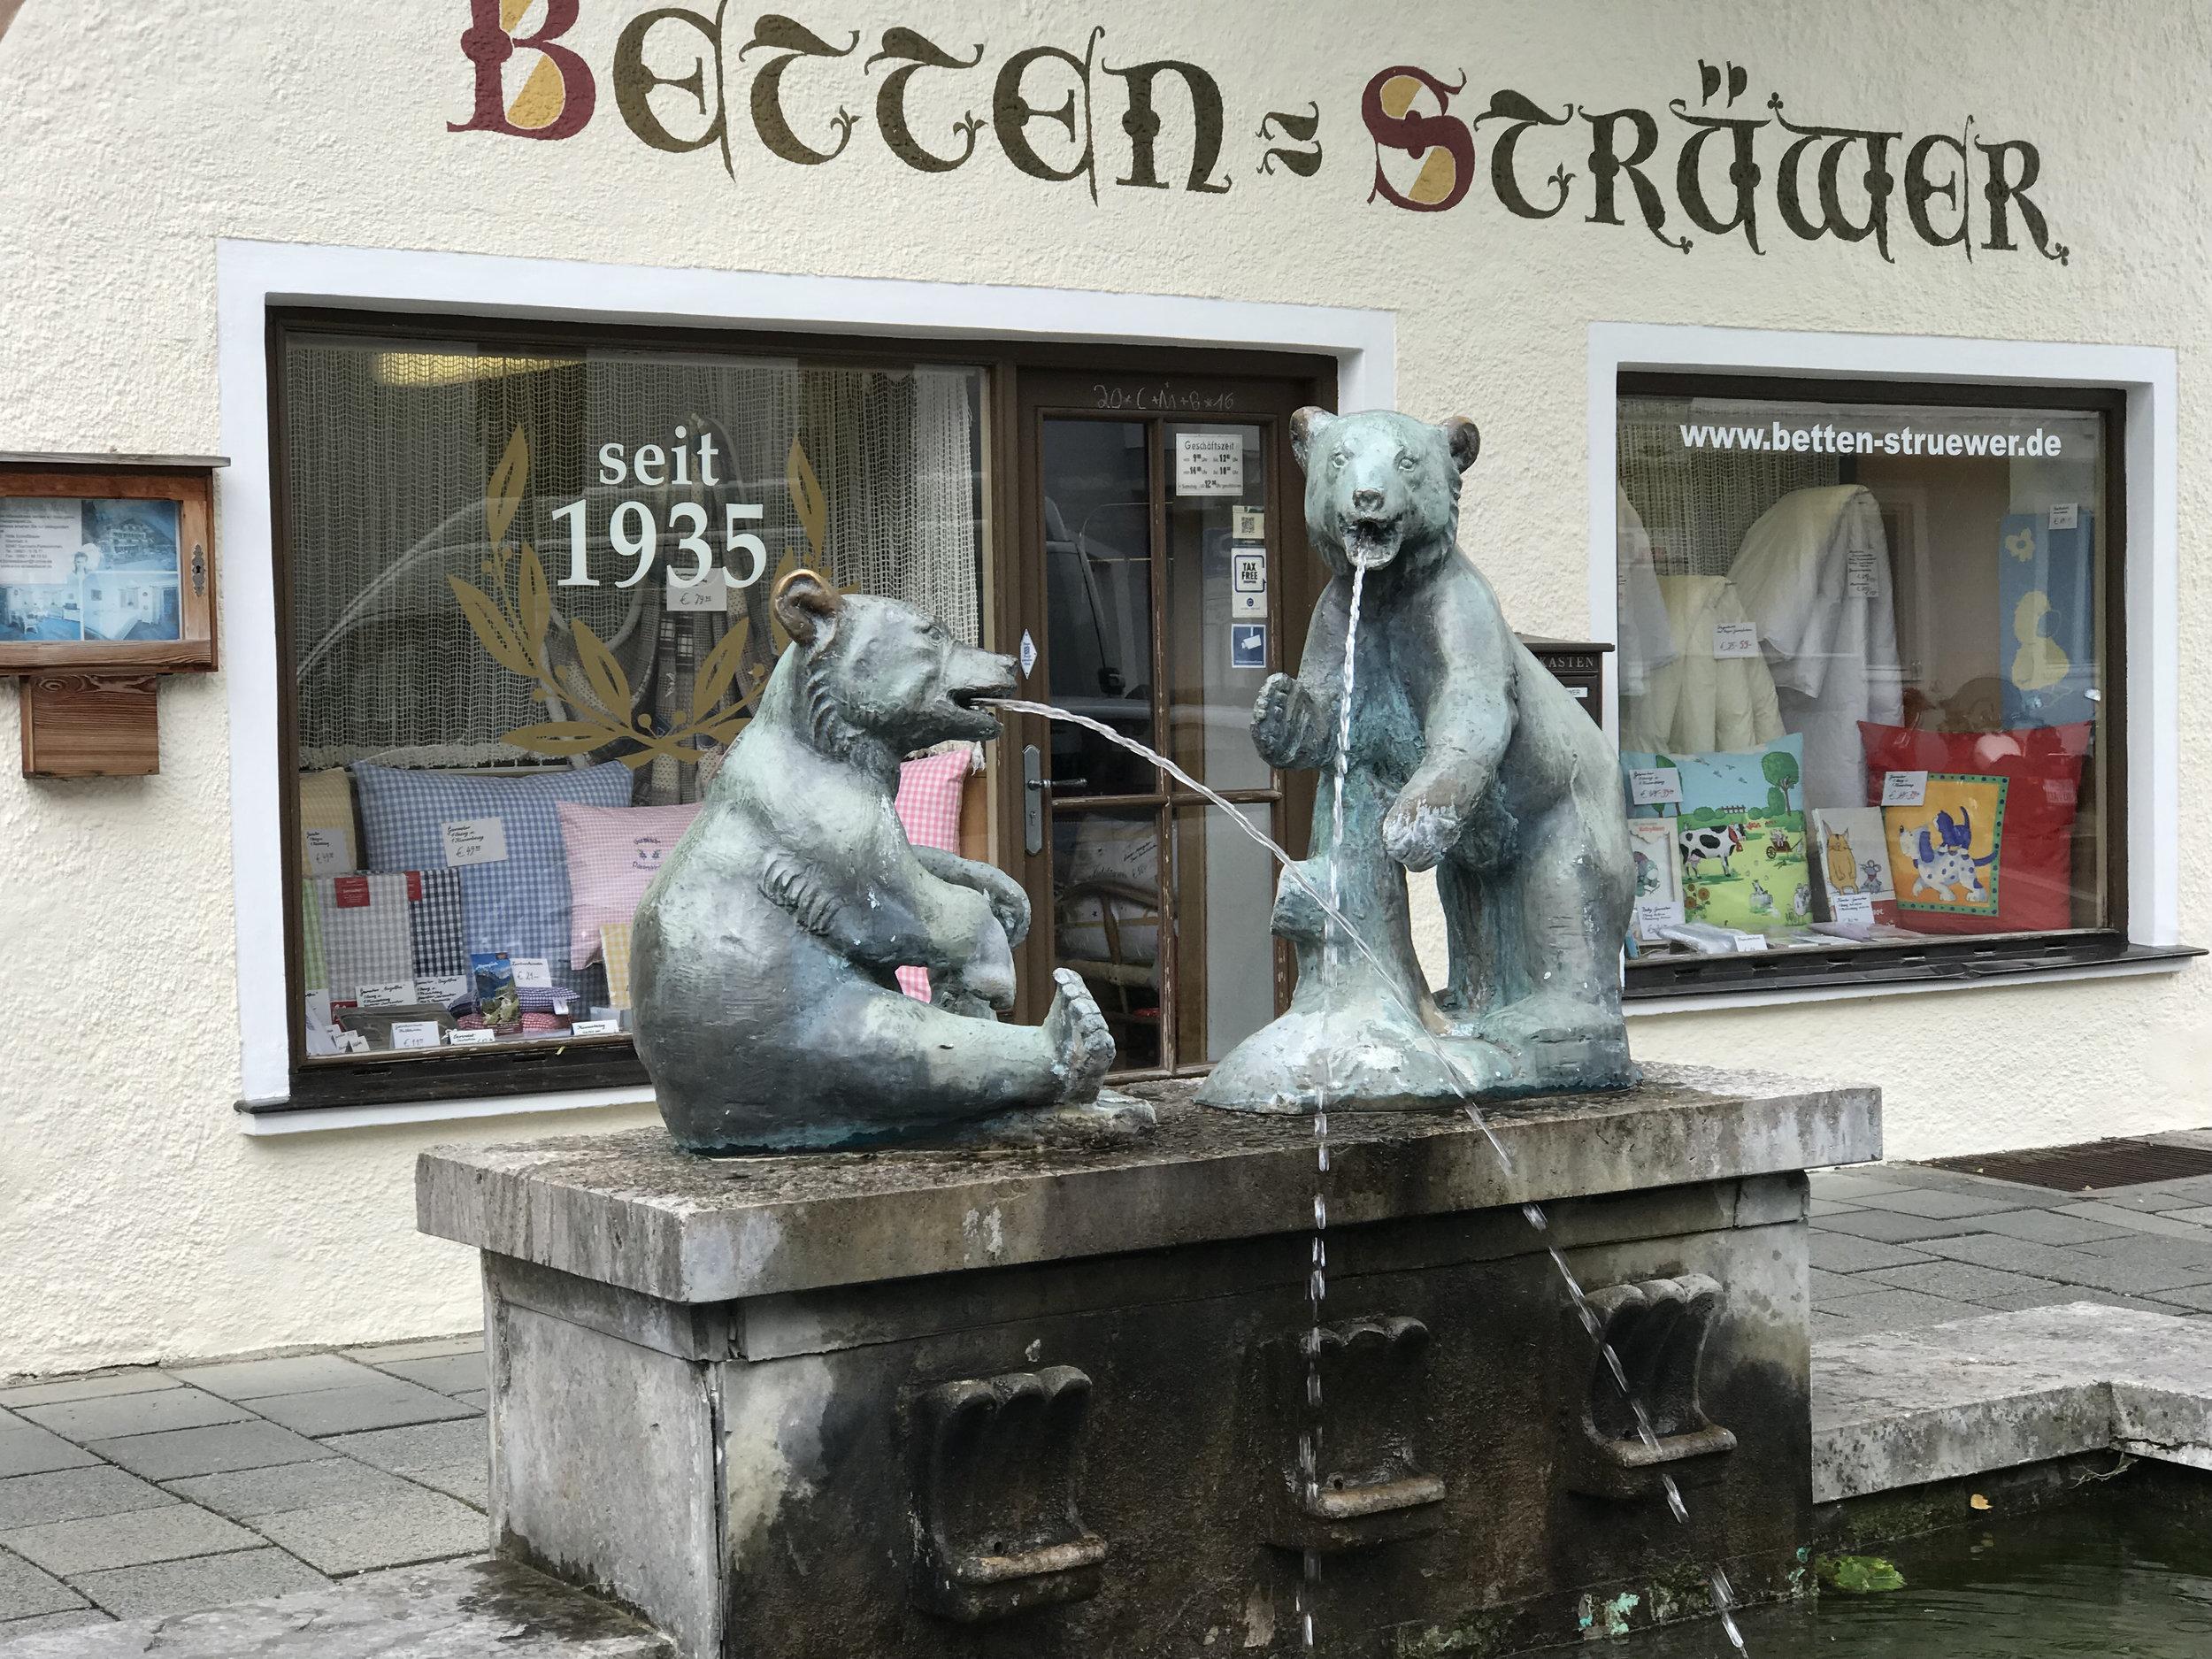 Teri_Bavaria_part3_spiritedtable_photo01.jpg